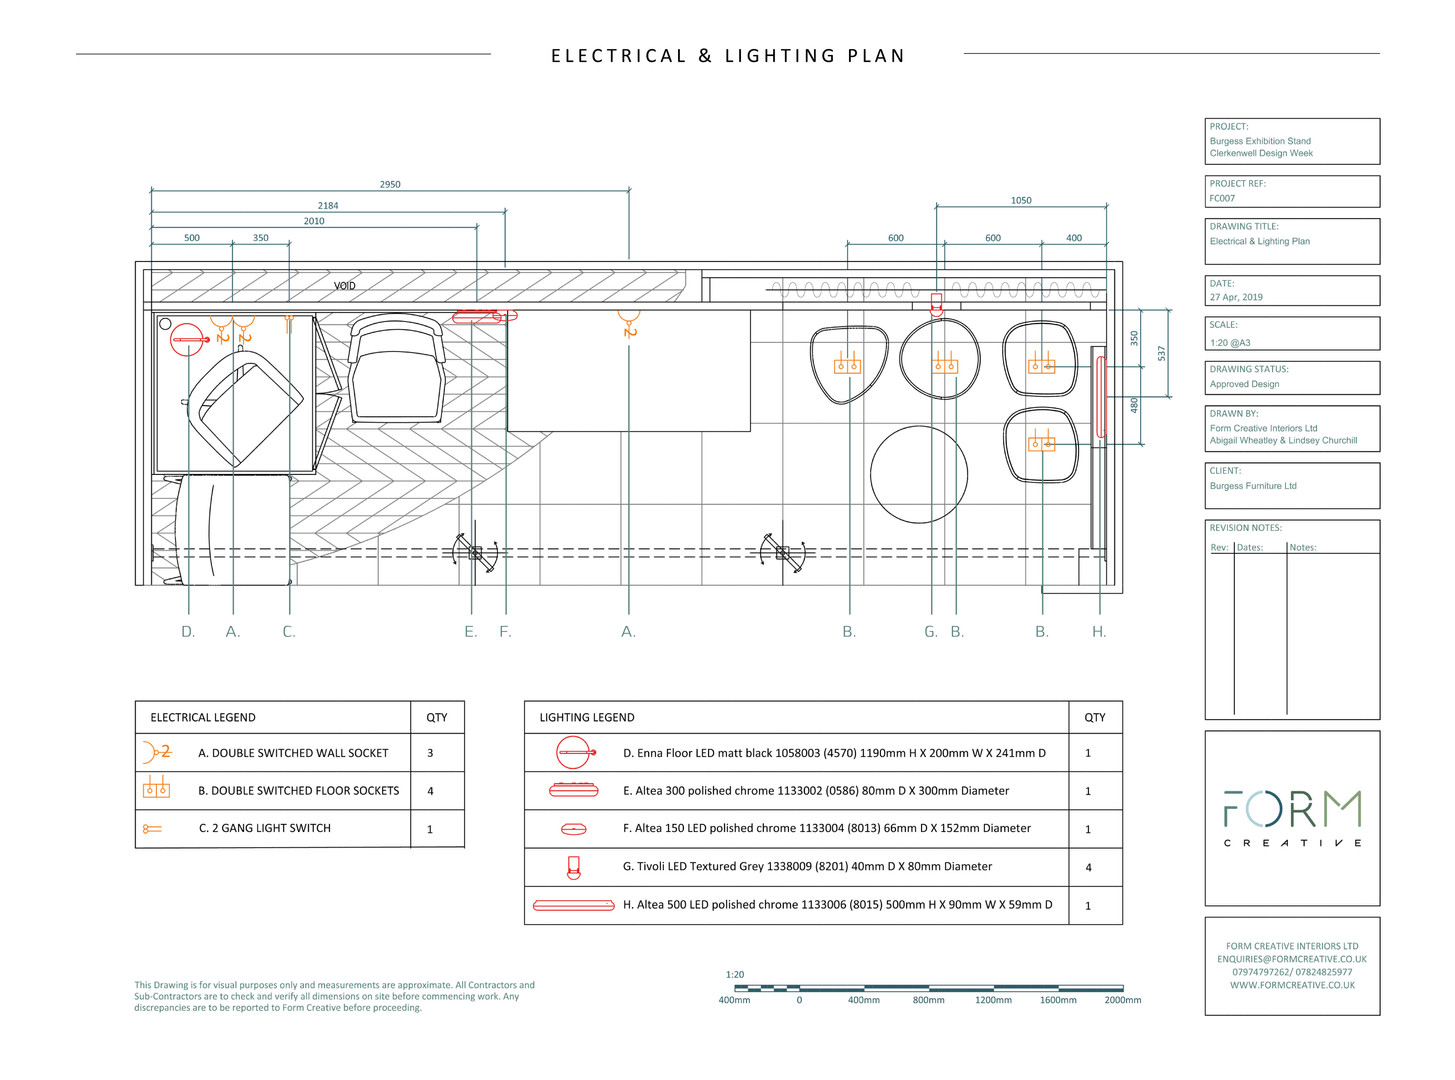 PHOTOBOX_BURGESS CDW EXHIBITION DESIGN 2